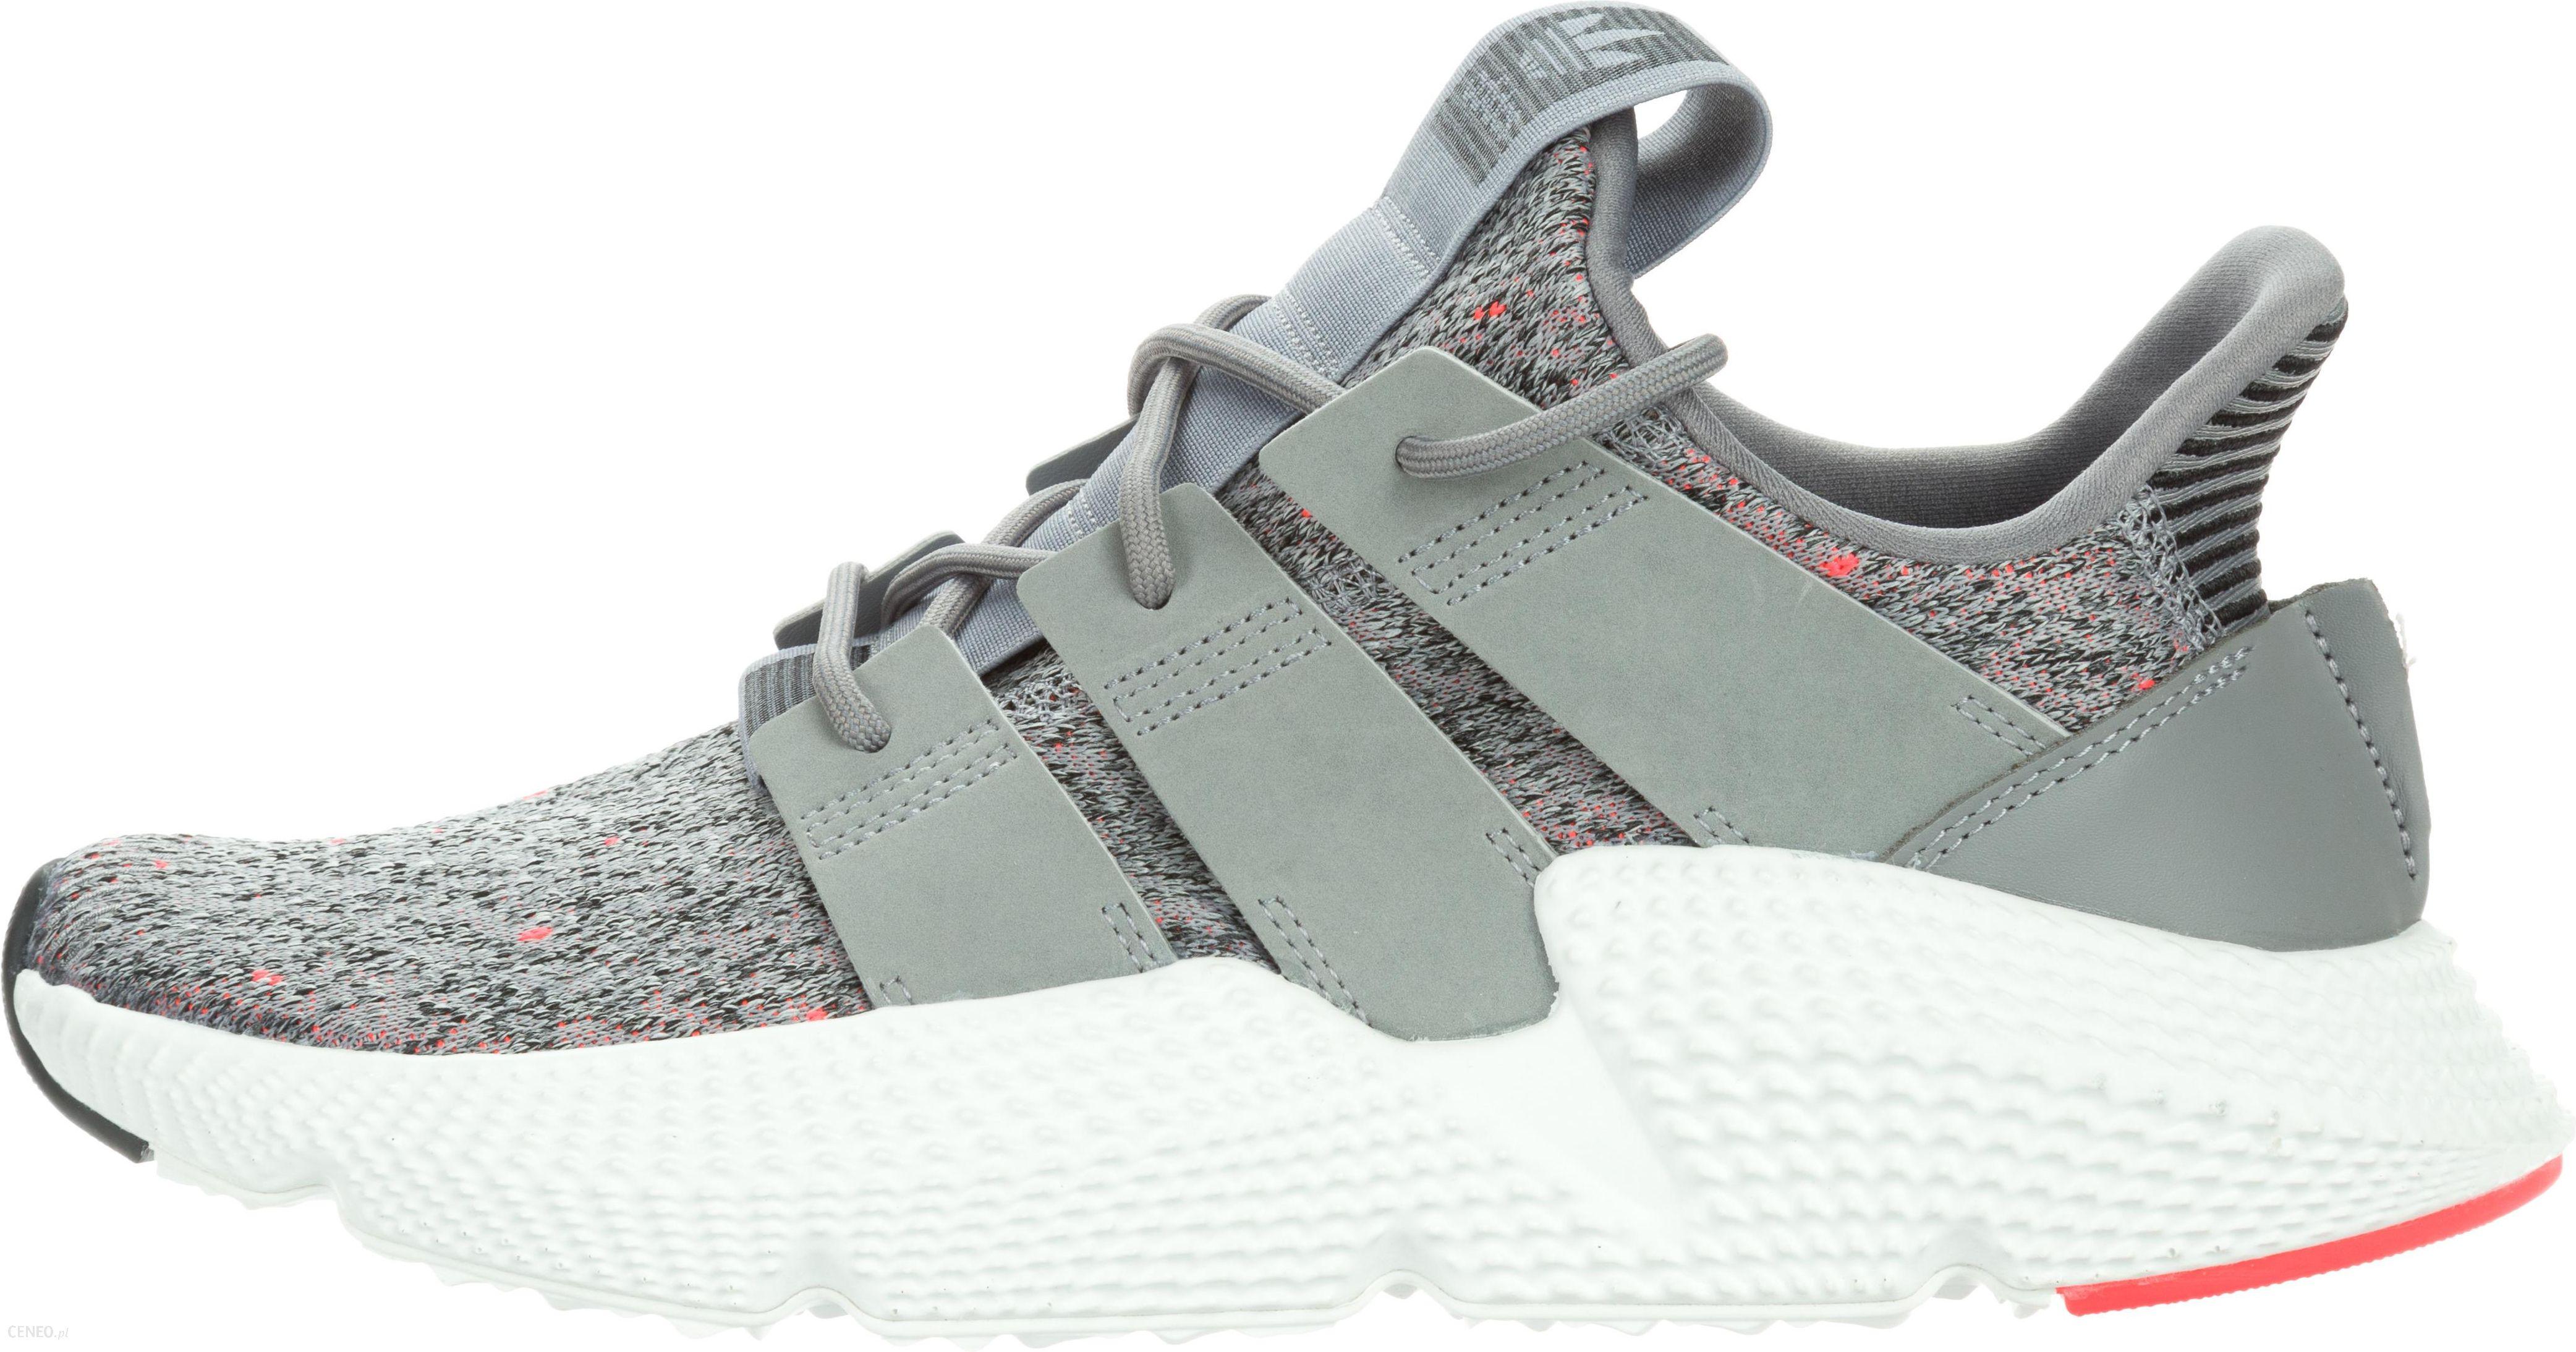 Adidas Originals Prophere Sneakers Szary 40 23 Ceny i opinie Ceneo.pl